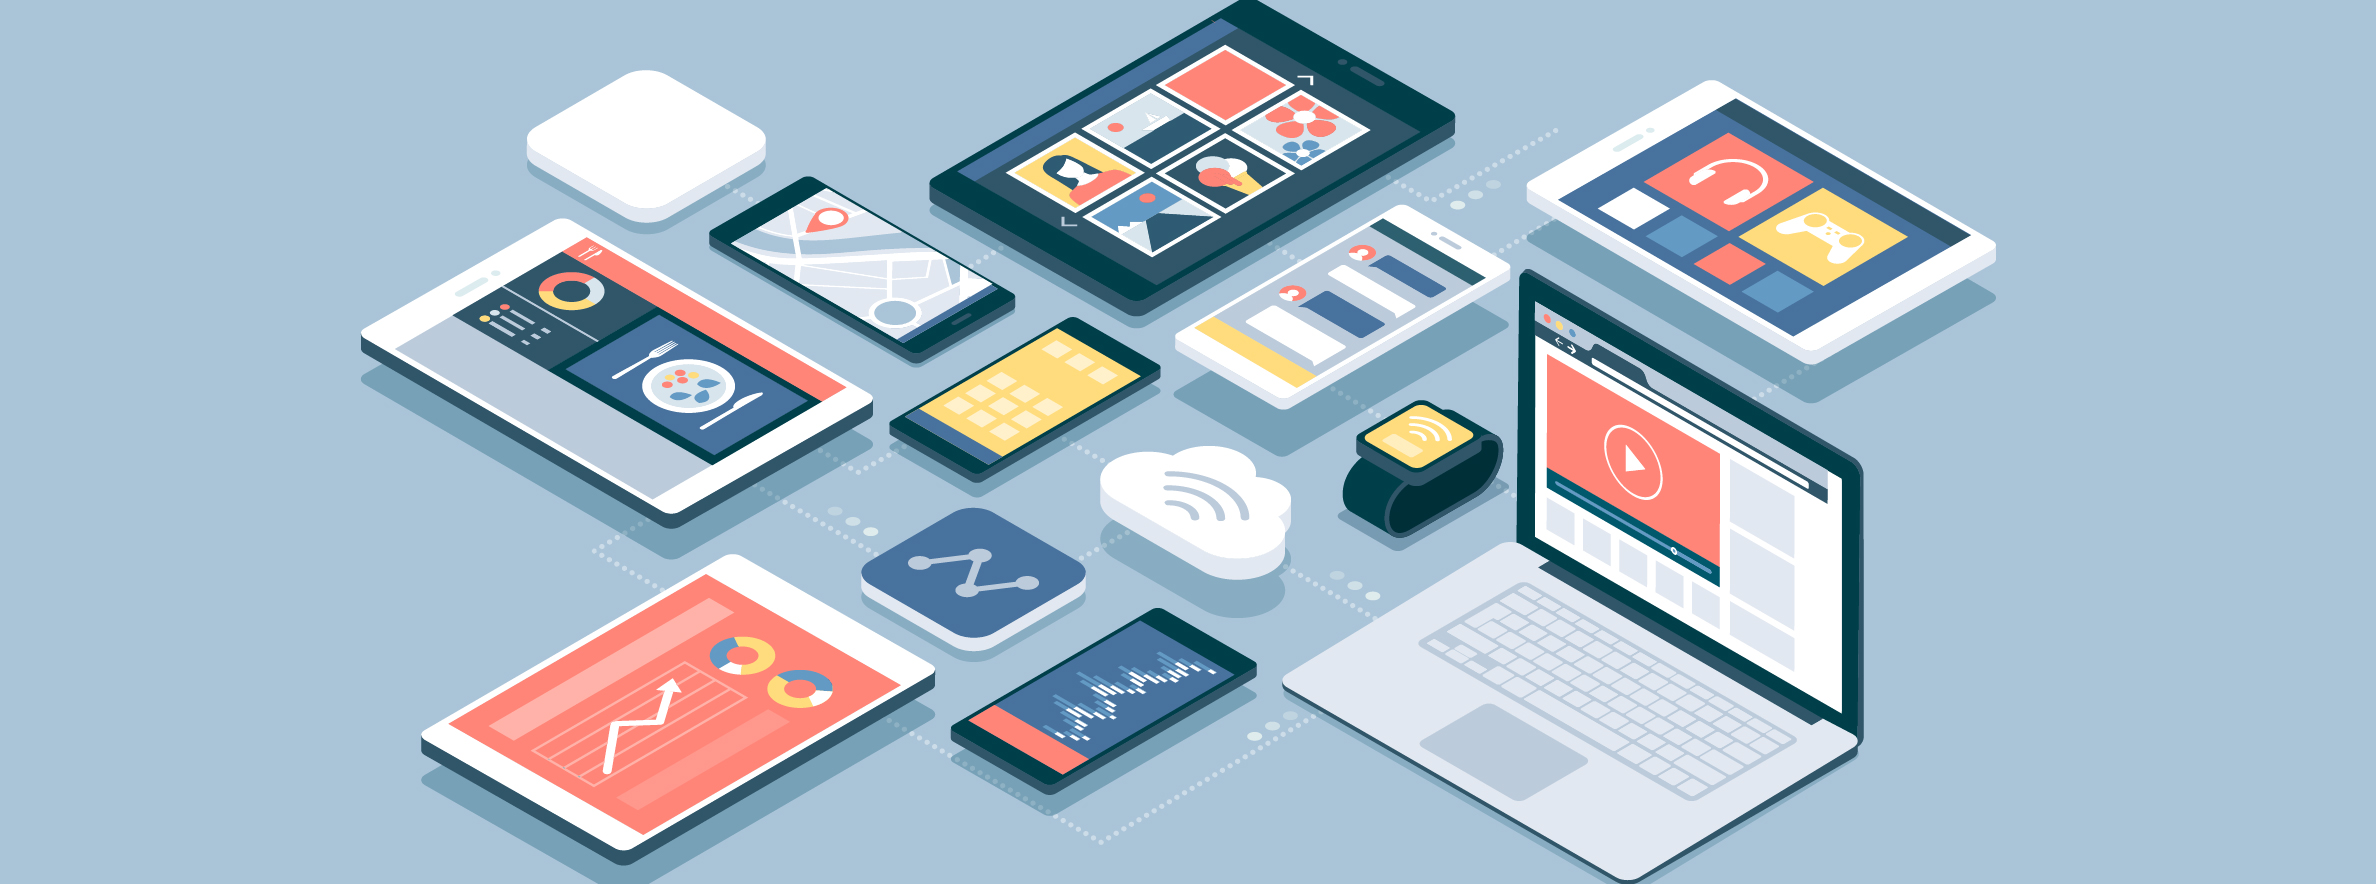 Wiki Bild Mobile Device Management